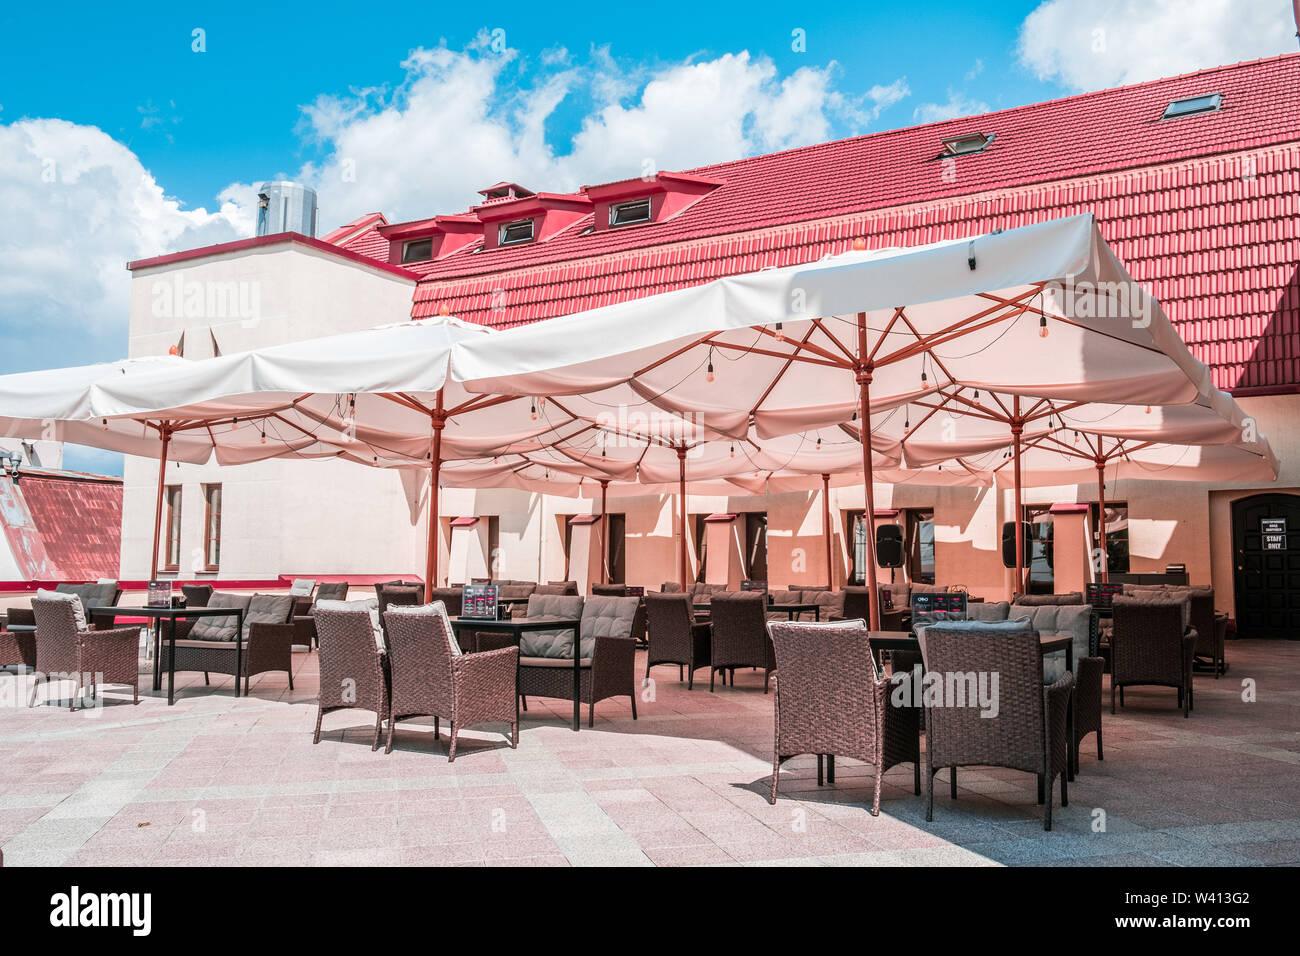 Cosy Outdoor Restaurant In Historical Minsk City Center In Belarus Stock Photo Alamy